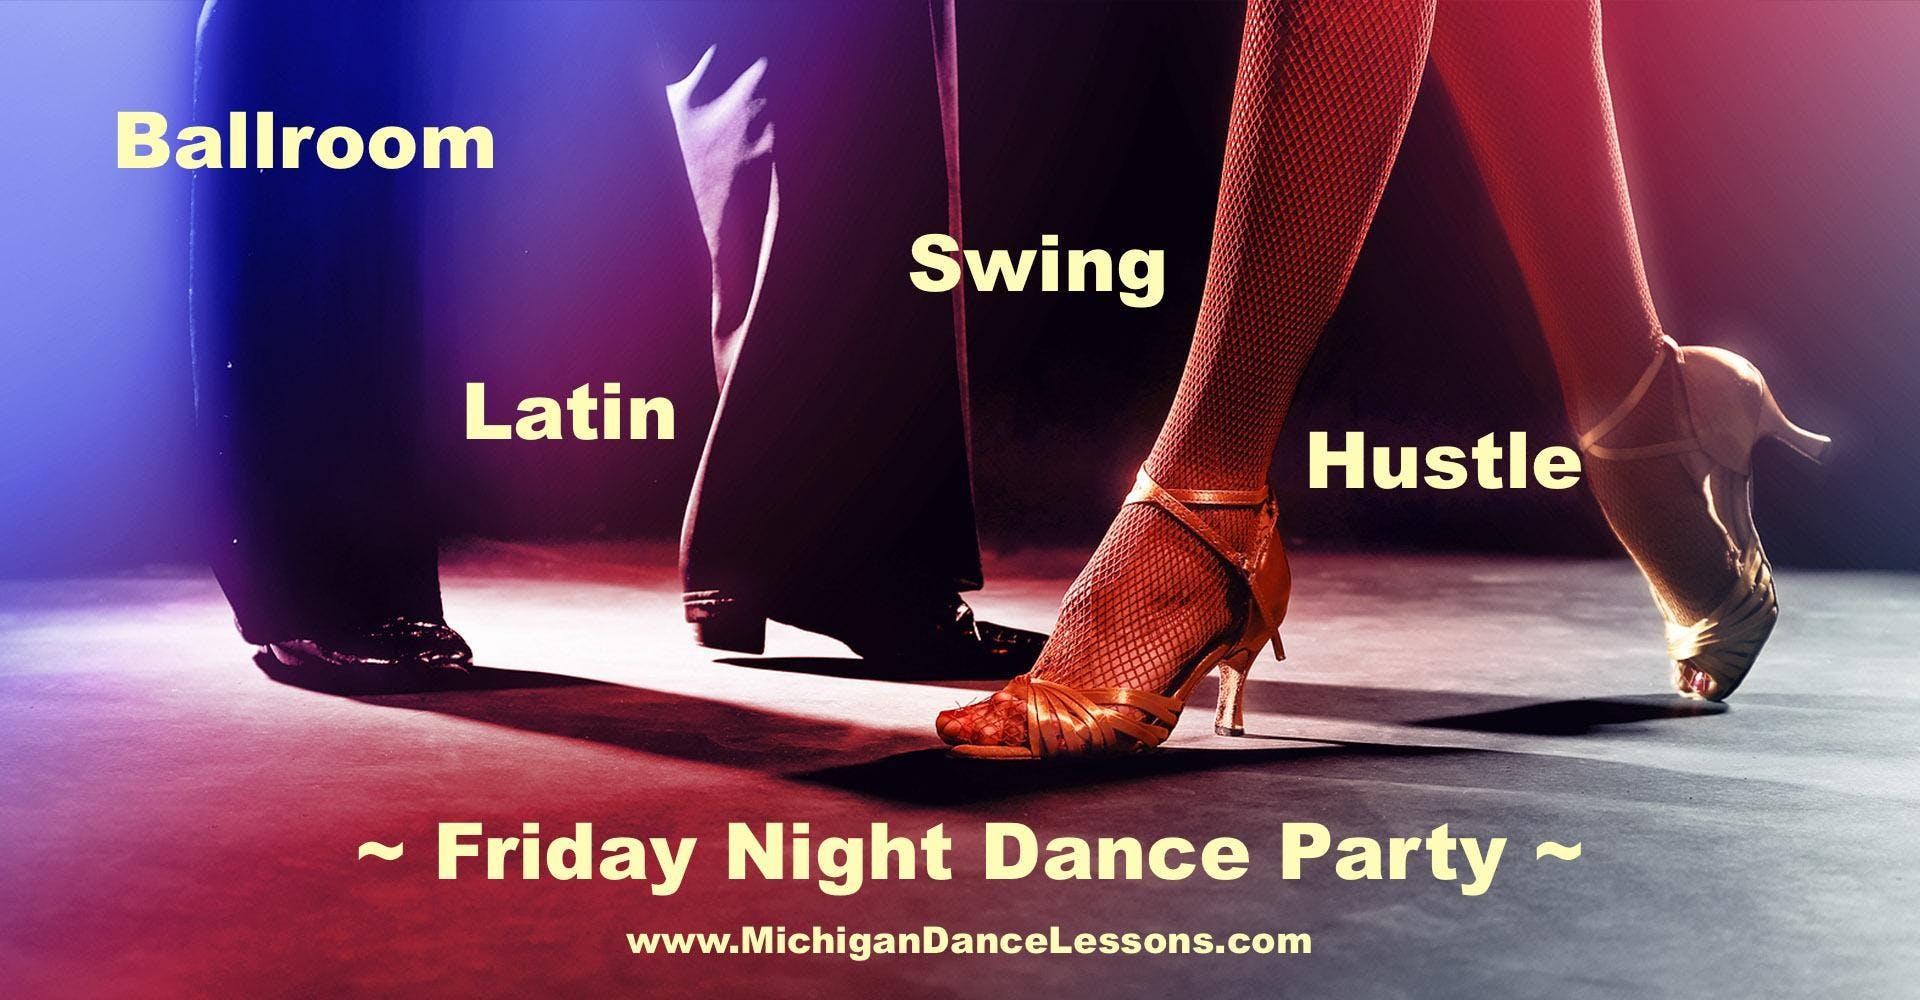 Friday Night Dance Party - Ballroom~Latin~Swing~Hustle